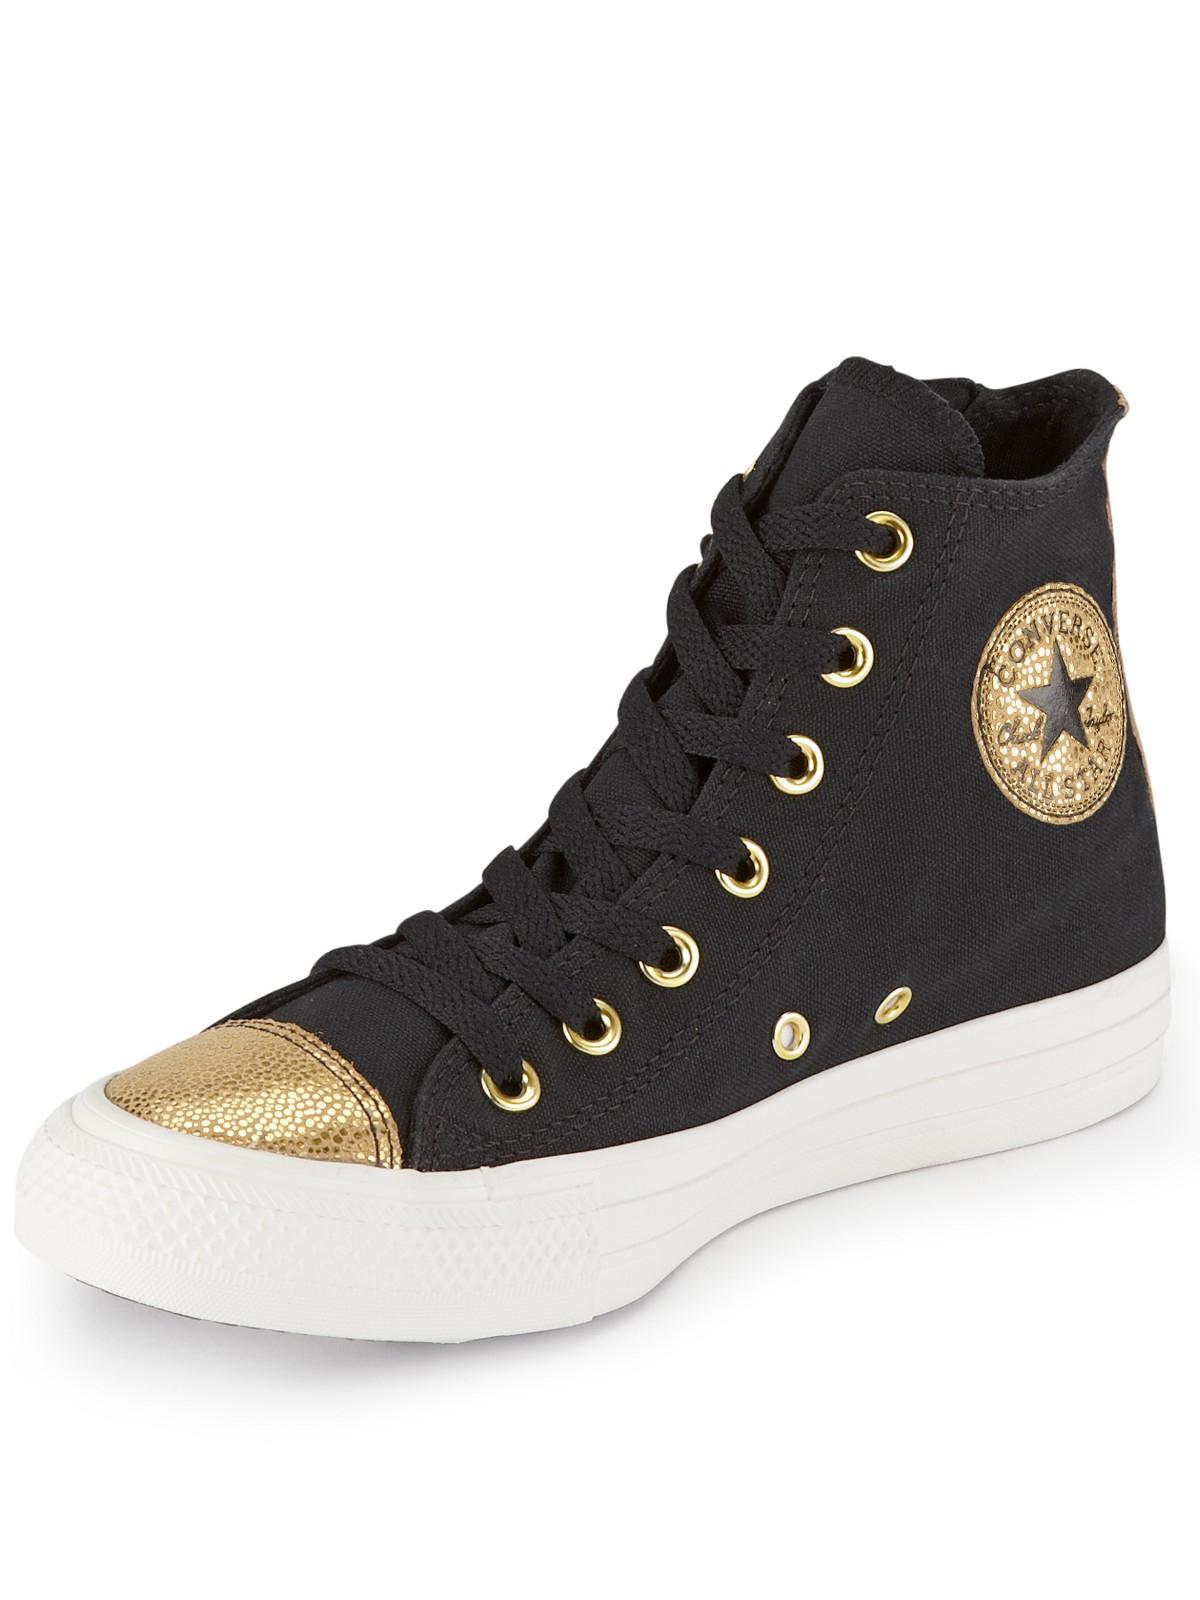 Converse Chuck Taylor All Star Side Zip Sparkle Toe Cap